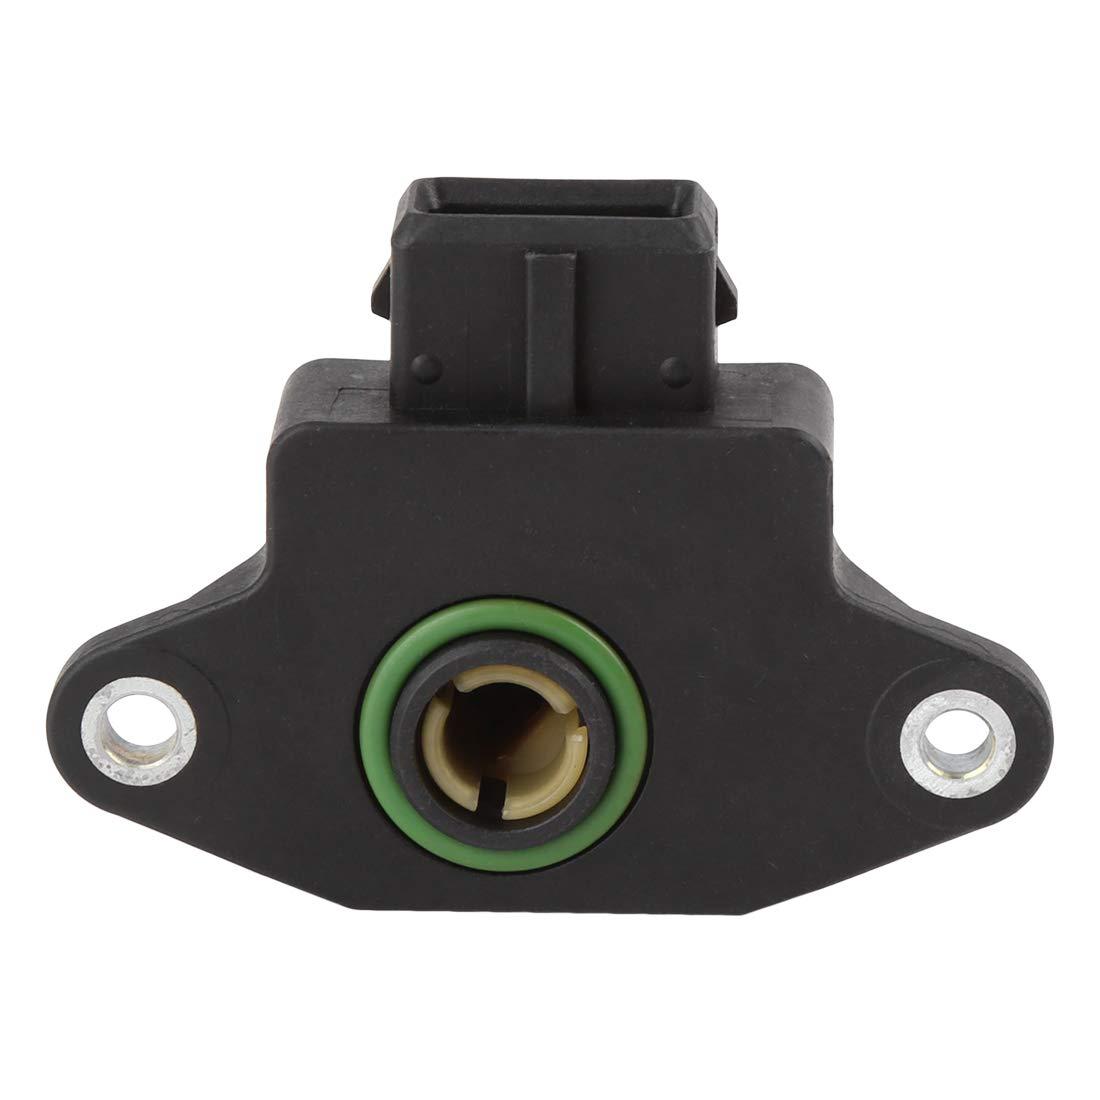 X AUTOHAUX Throttle Position Sensor 0280122001 for Kia Sportage Saab 900 9000 Hyundai Scoupe Volvo C70 S70 V70 V90 850 960